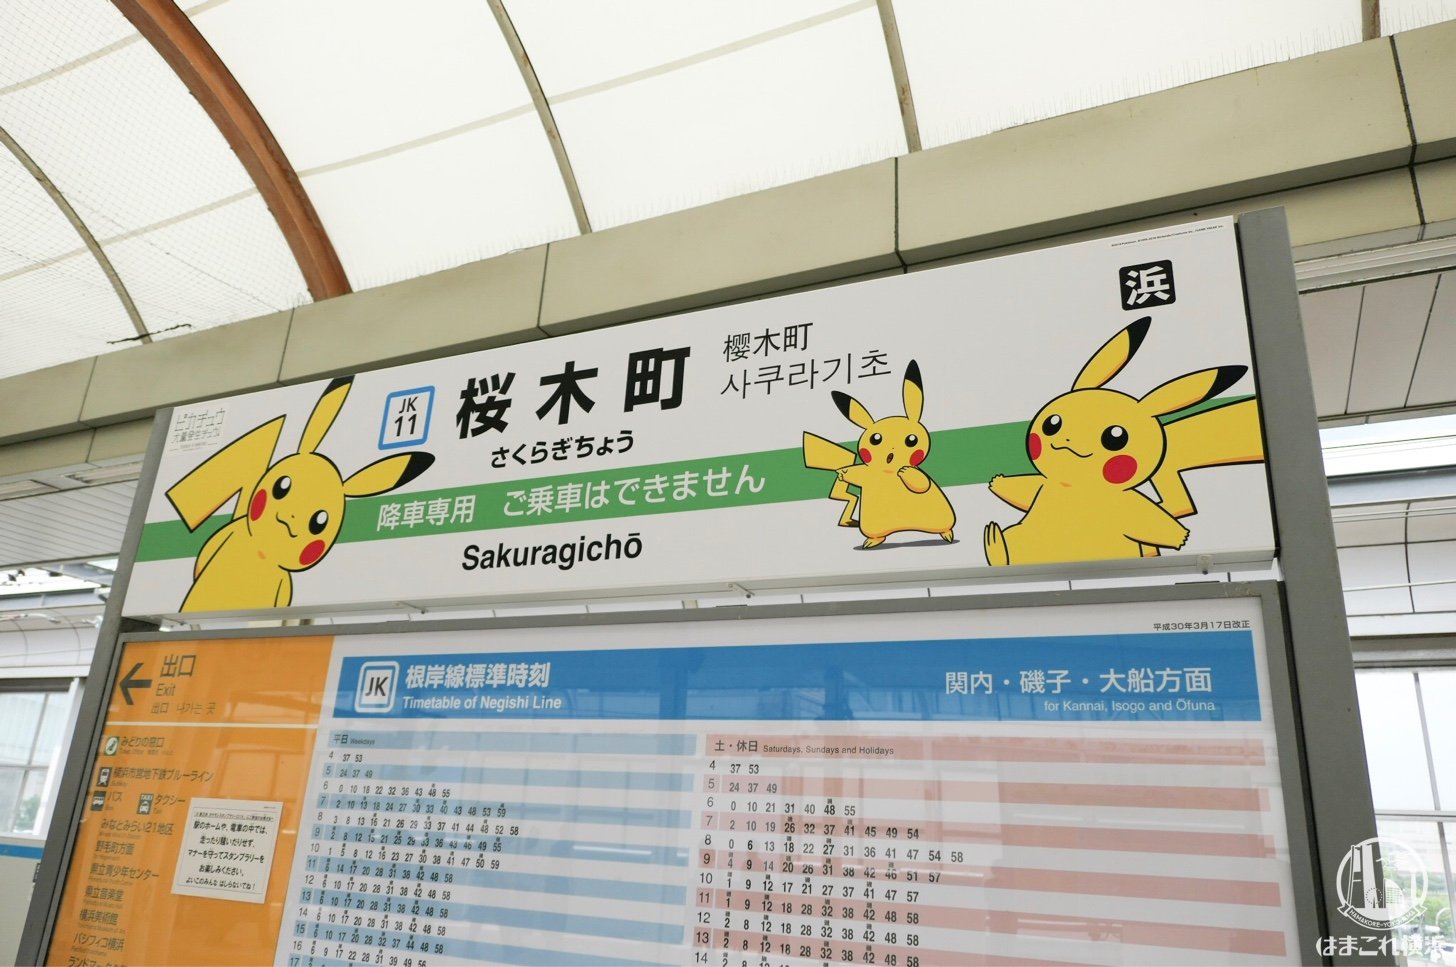 JR桜木町駅 下り線(大船駅方面)ピカチュウ装飾